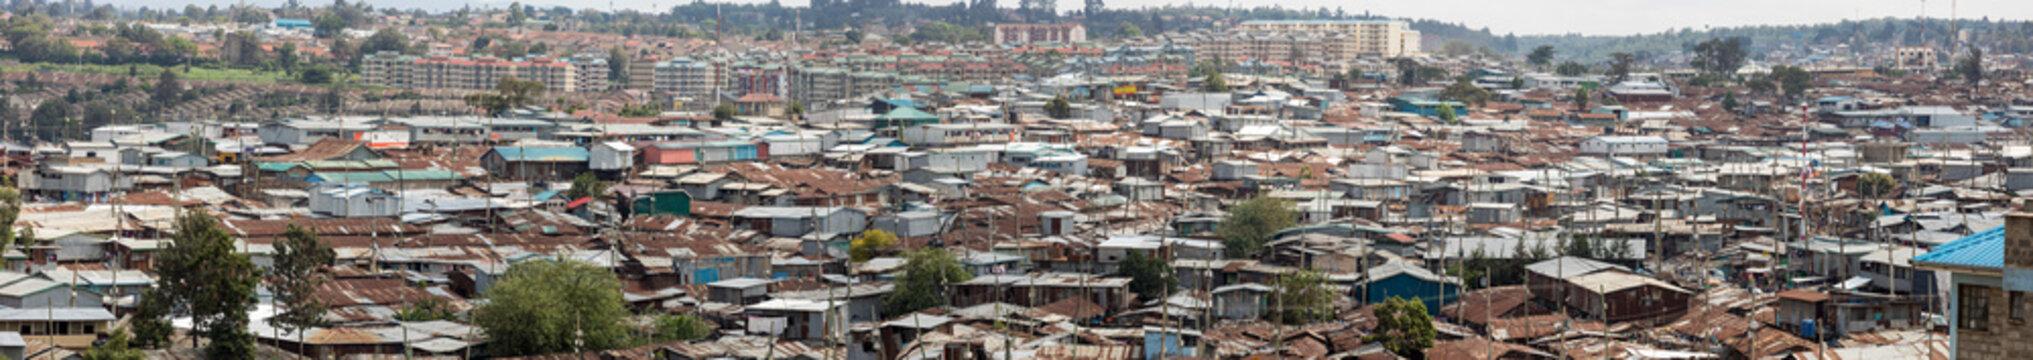 180 degree panorama of the vast slums of Kibera, Kenya.